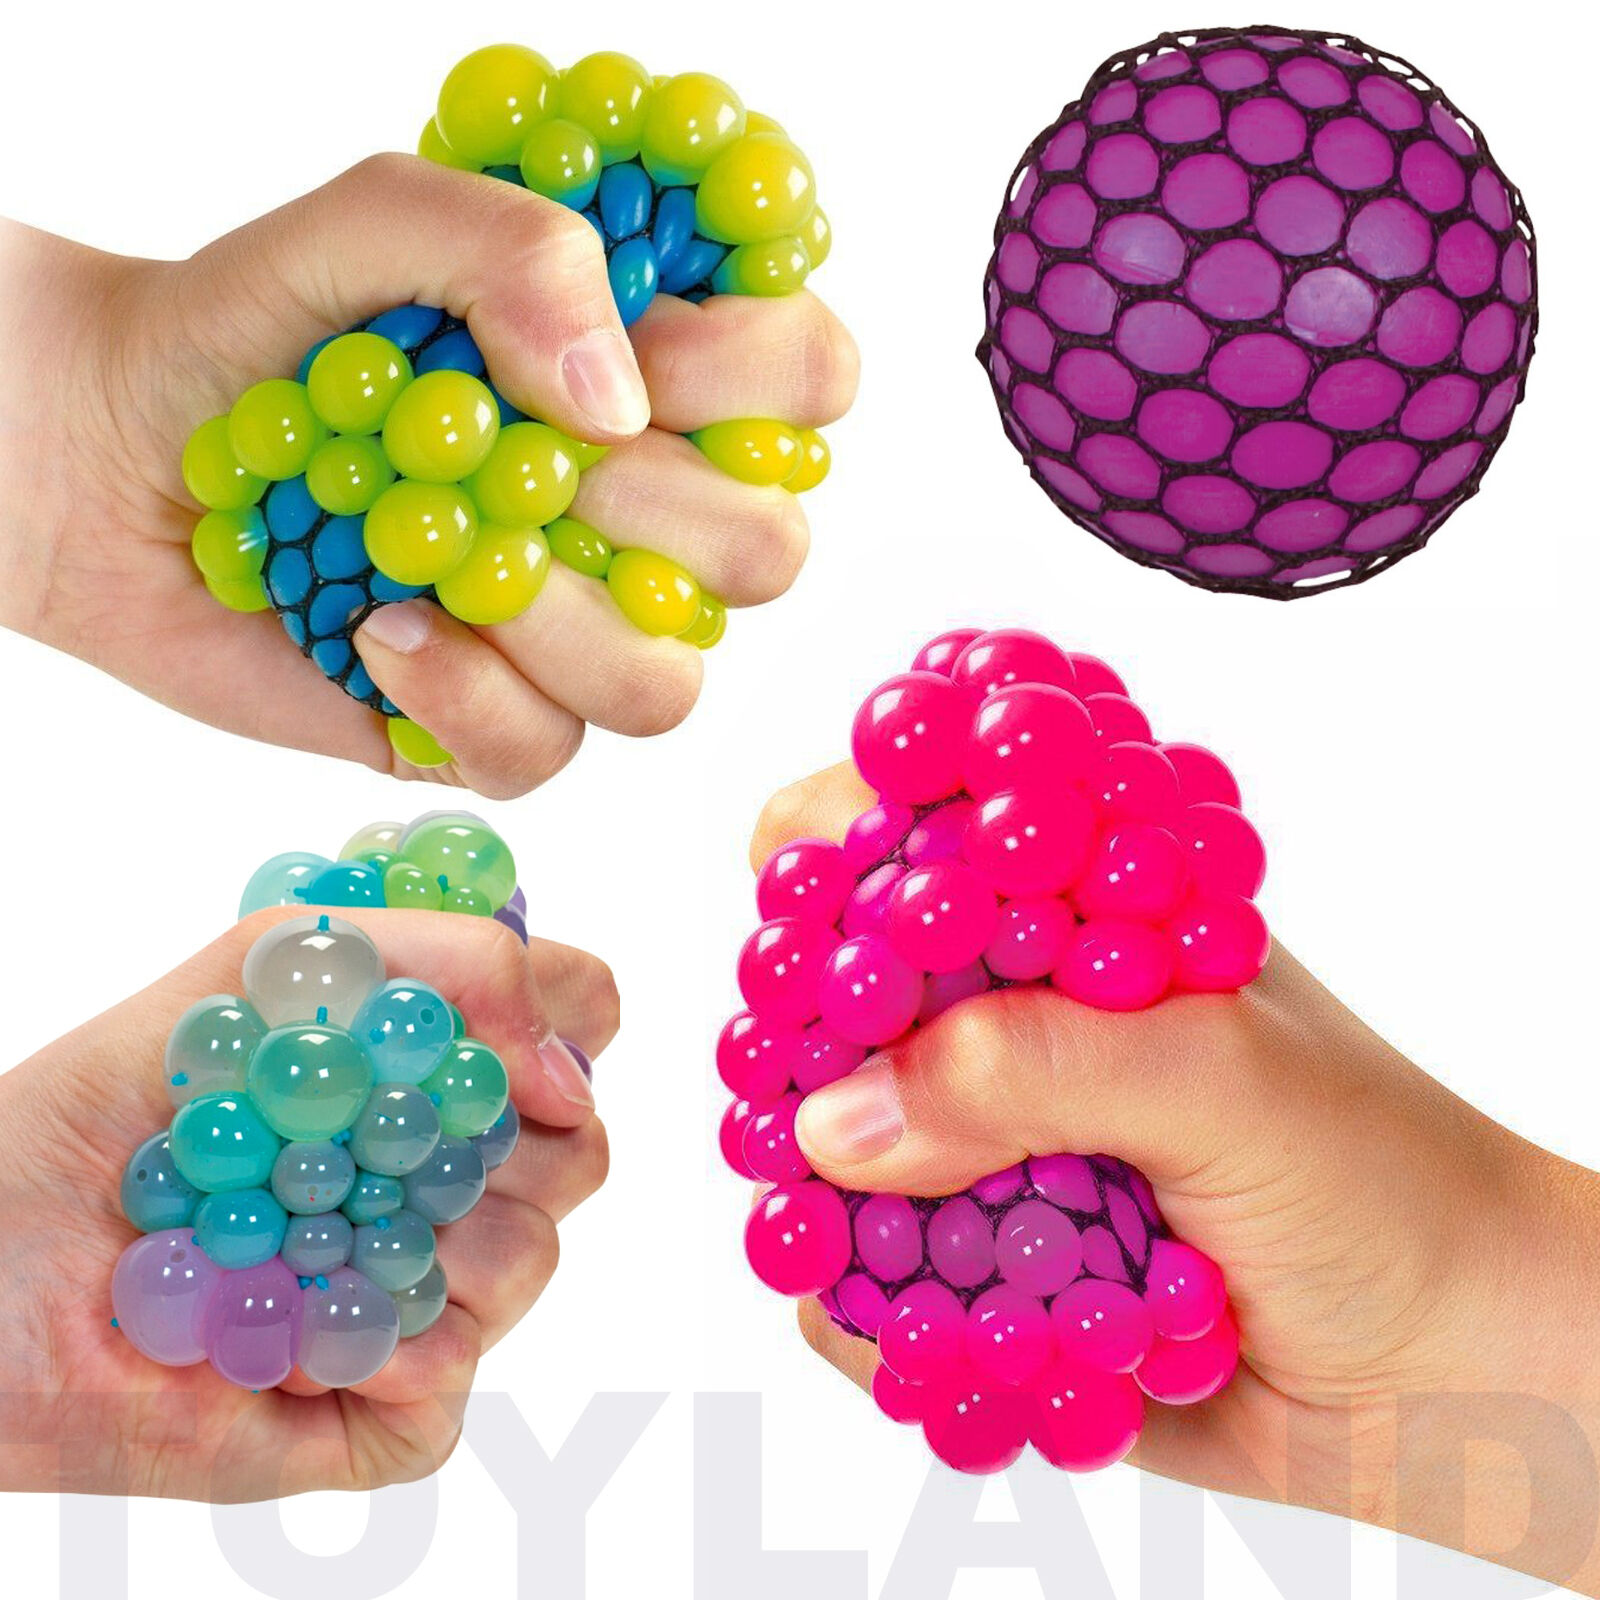 Mesh Ball Squeezy Stress Toy Boys Girl Fidget Toy Xmas